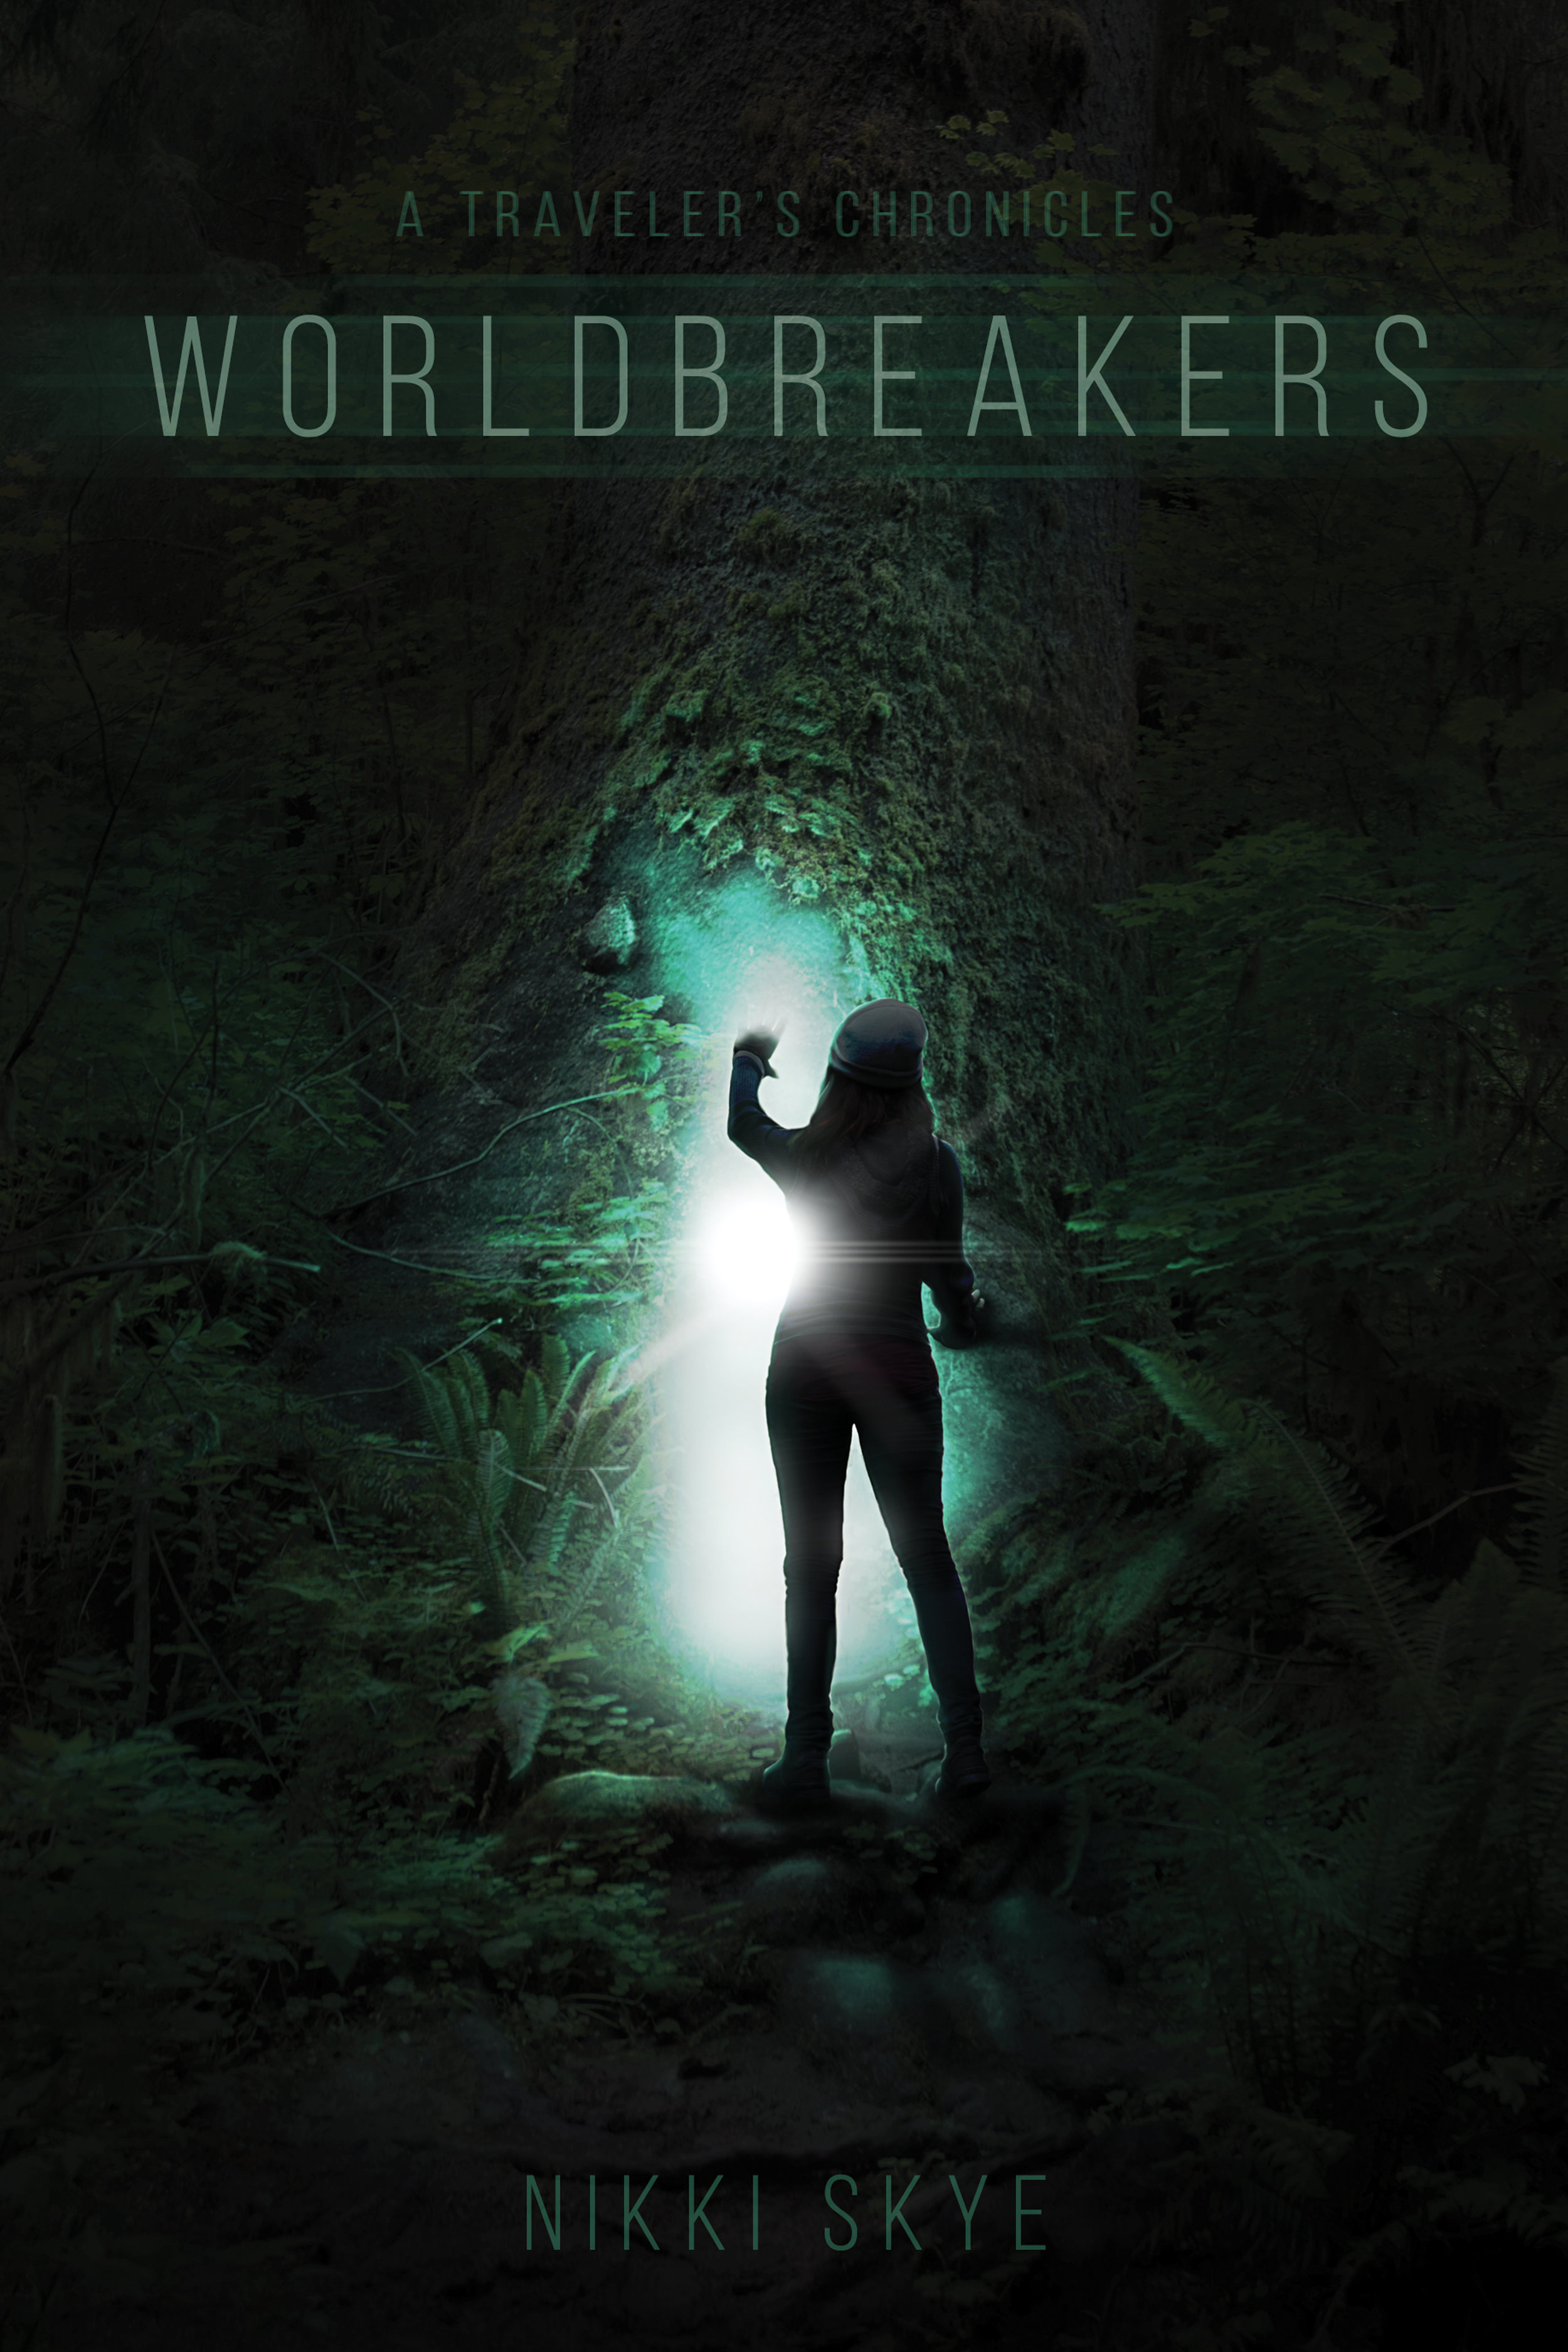 """A Traveler's Chronicles : Worldbreakers"" December 2018  Book cover art"